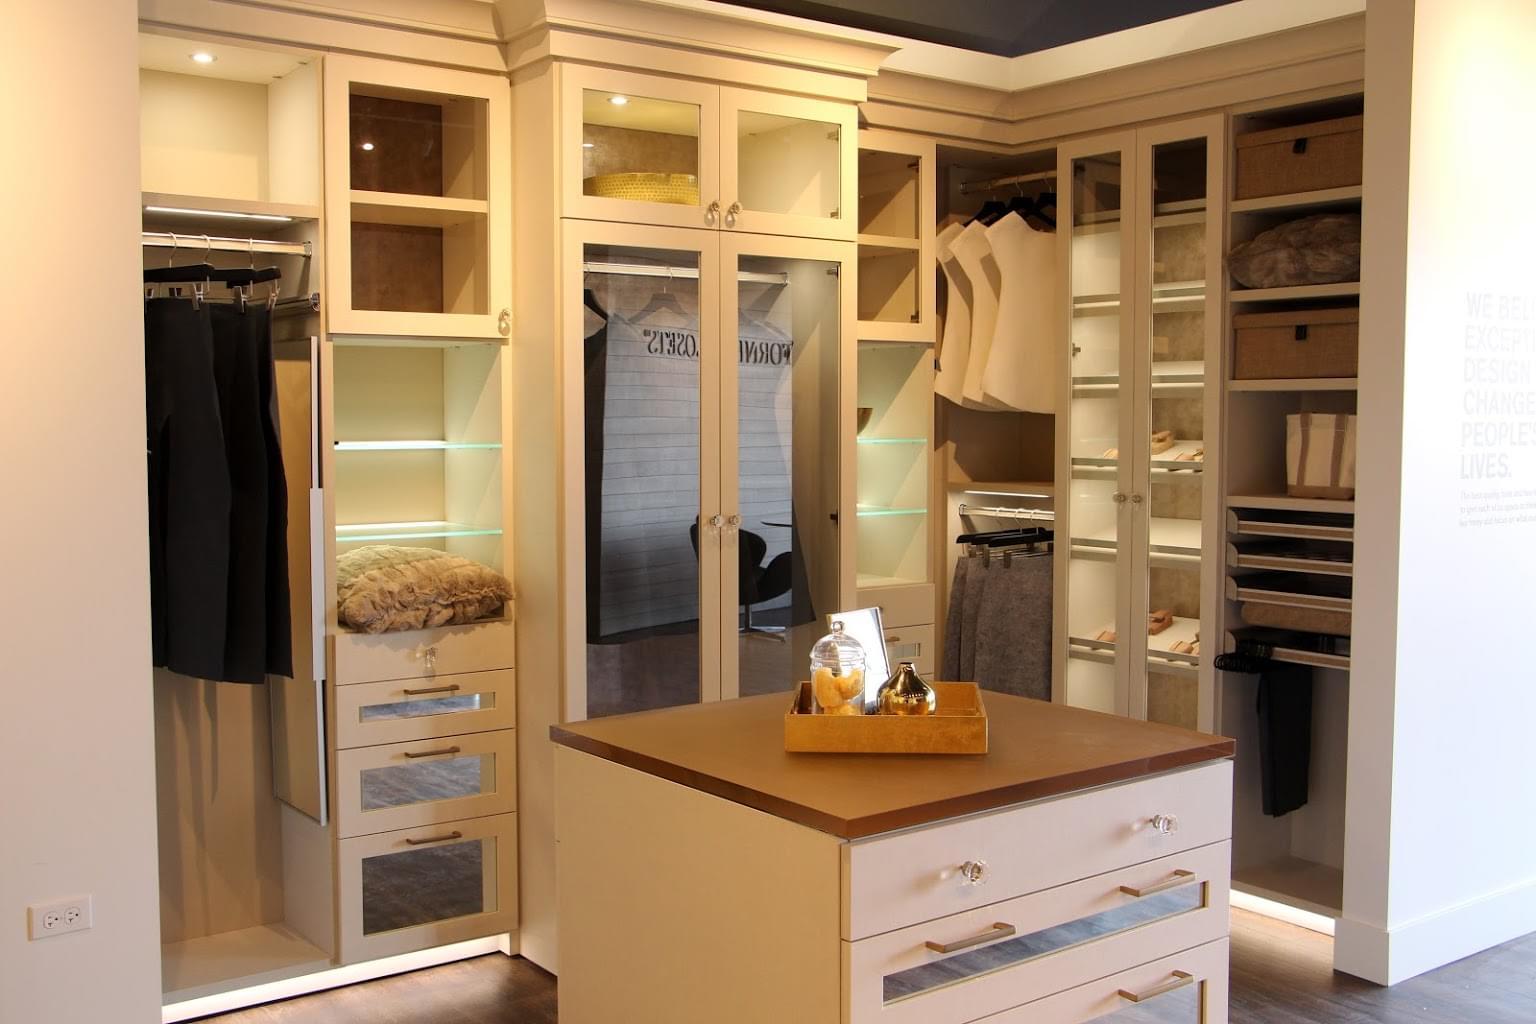 California Closets Interior Designer in Deerfield, IL